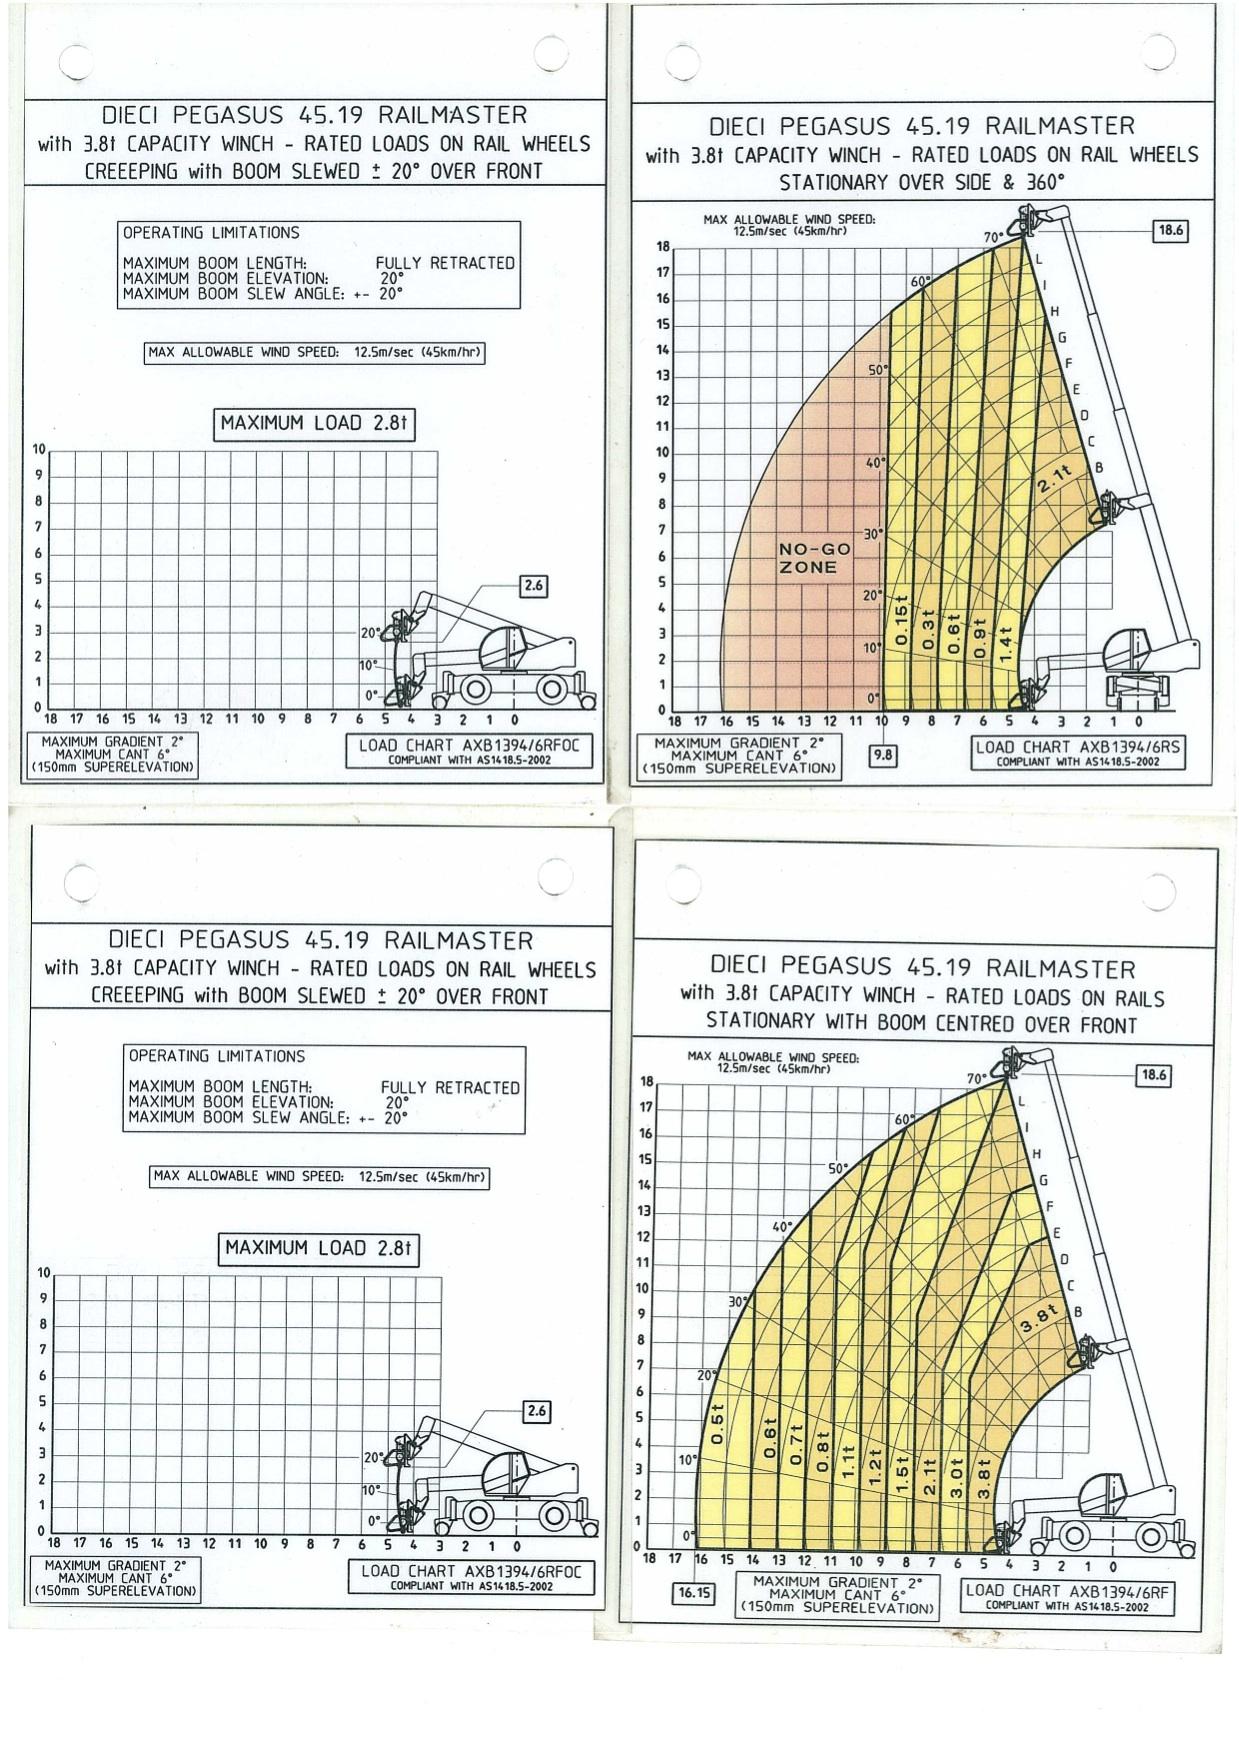 58577D-Dieci-PEGASUS-RAIL-MASTER-Telehandler-Load-Charts-8.jpg